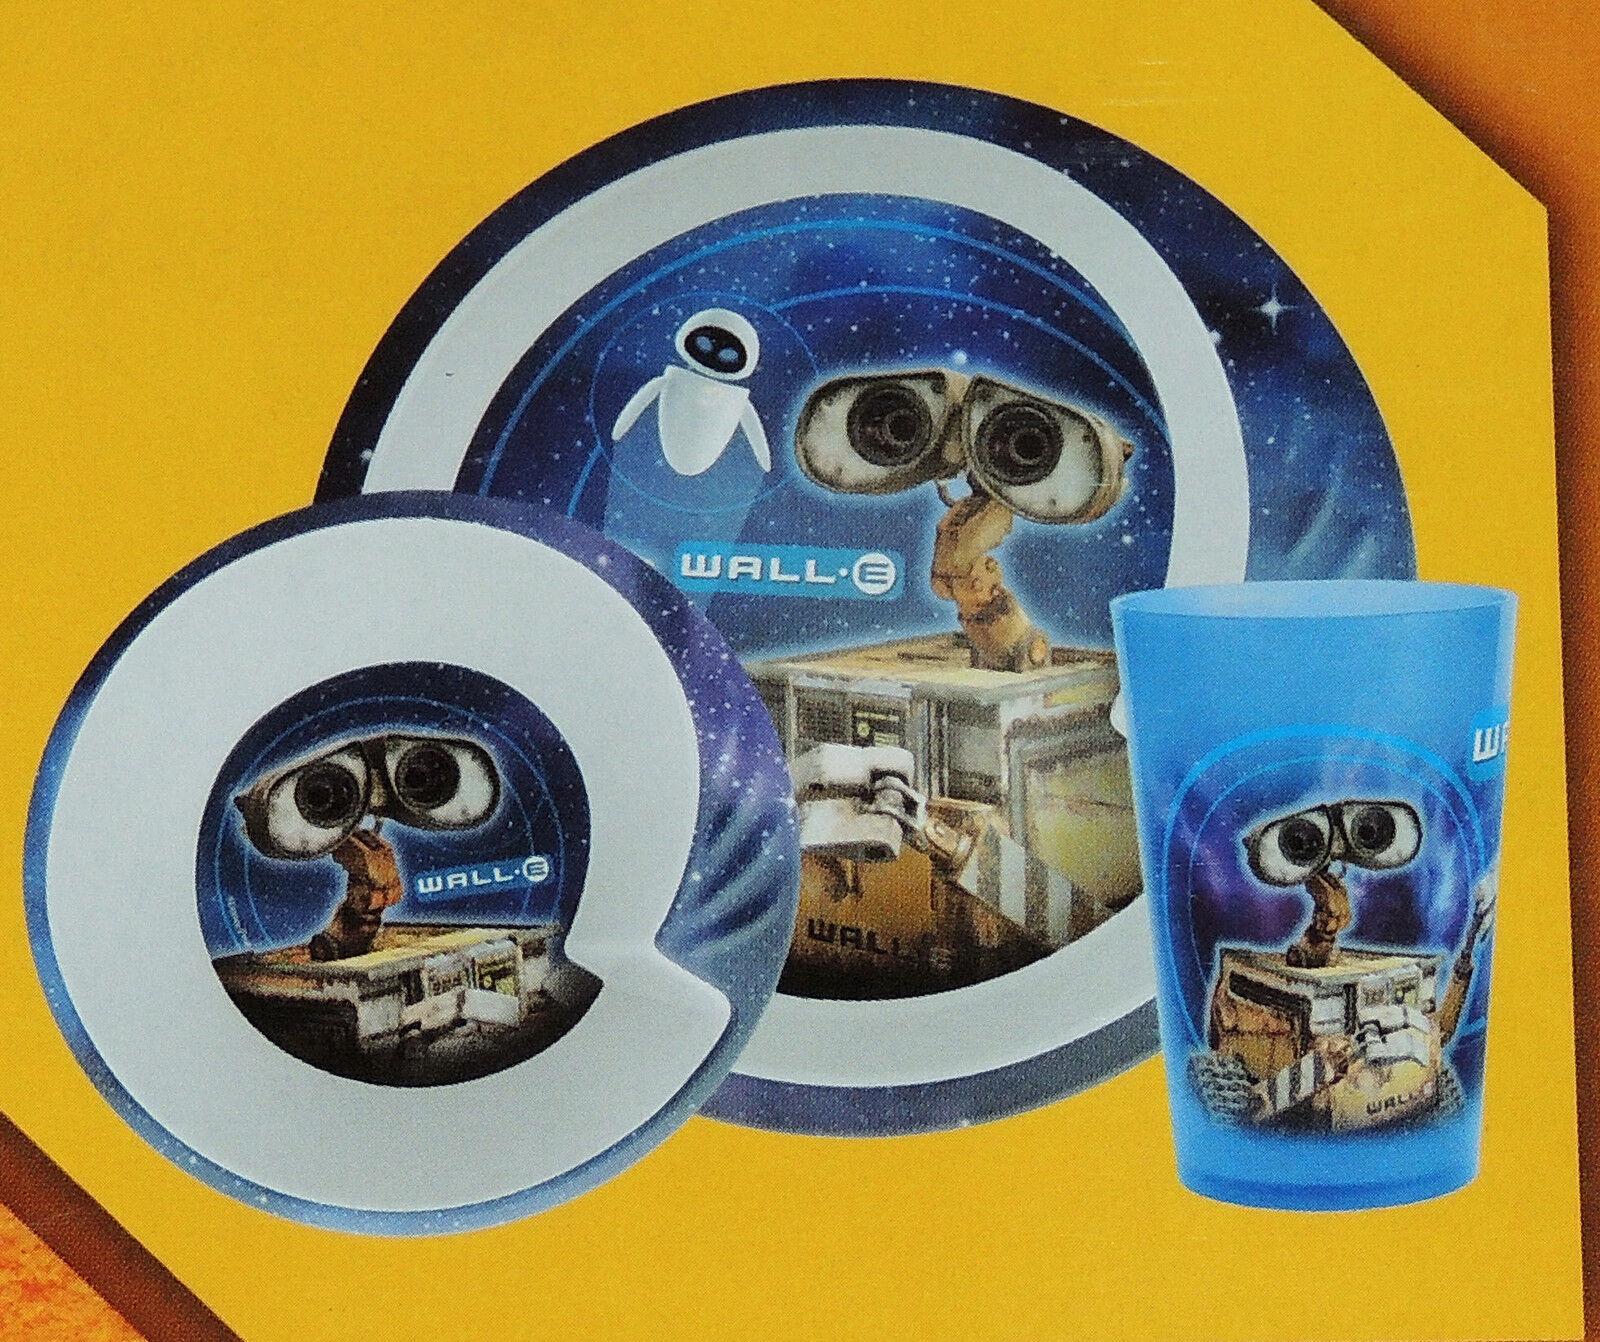 DISNEY  PIXAR WALL E DINNERWARE SET PLATE CUP AND FORK